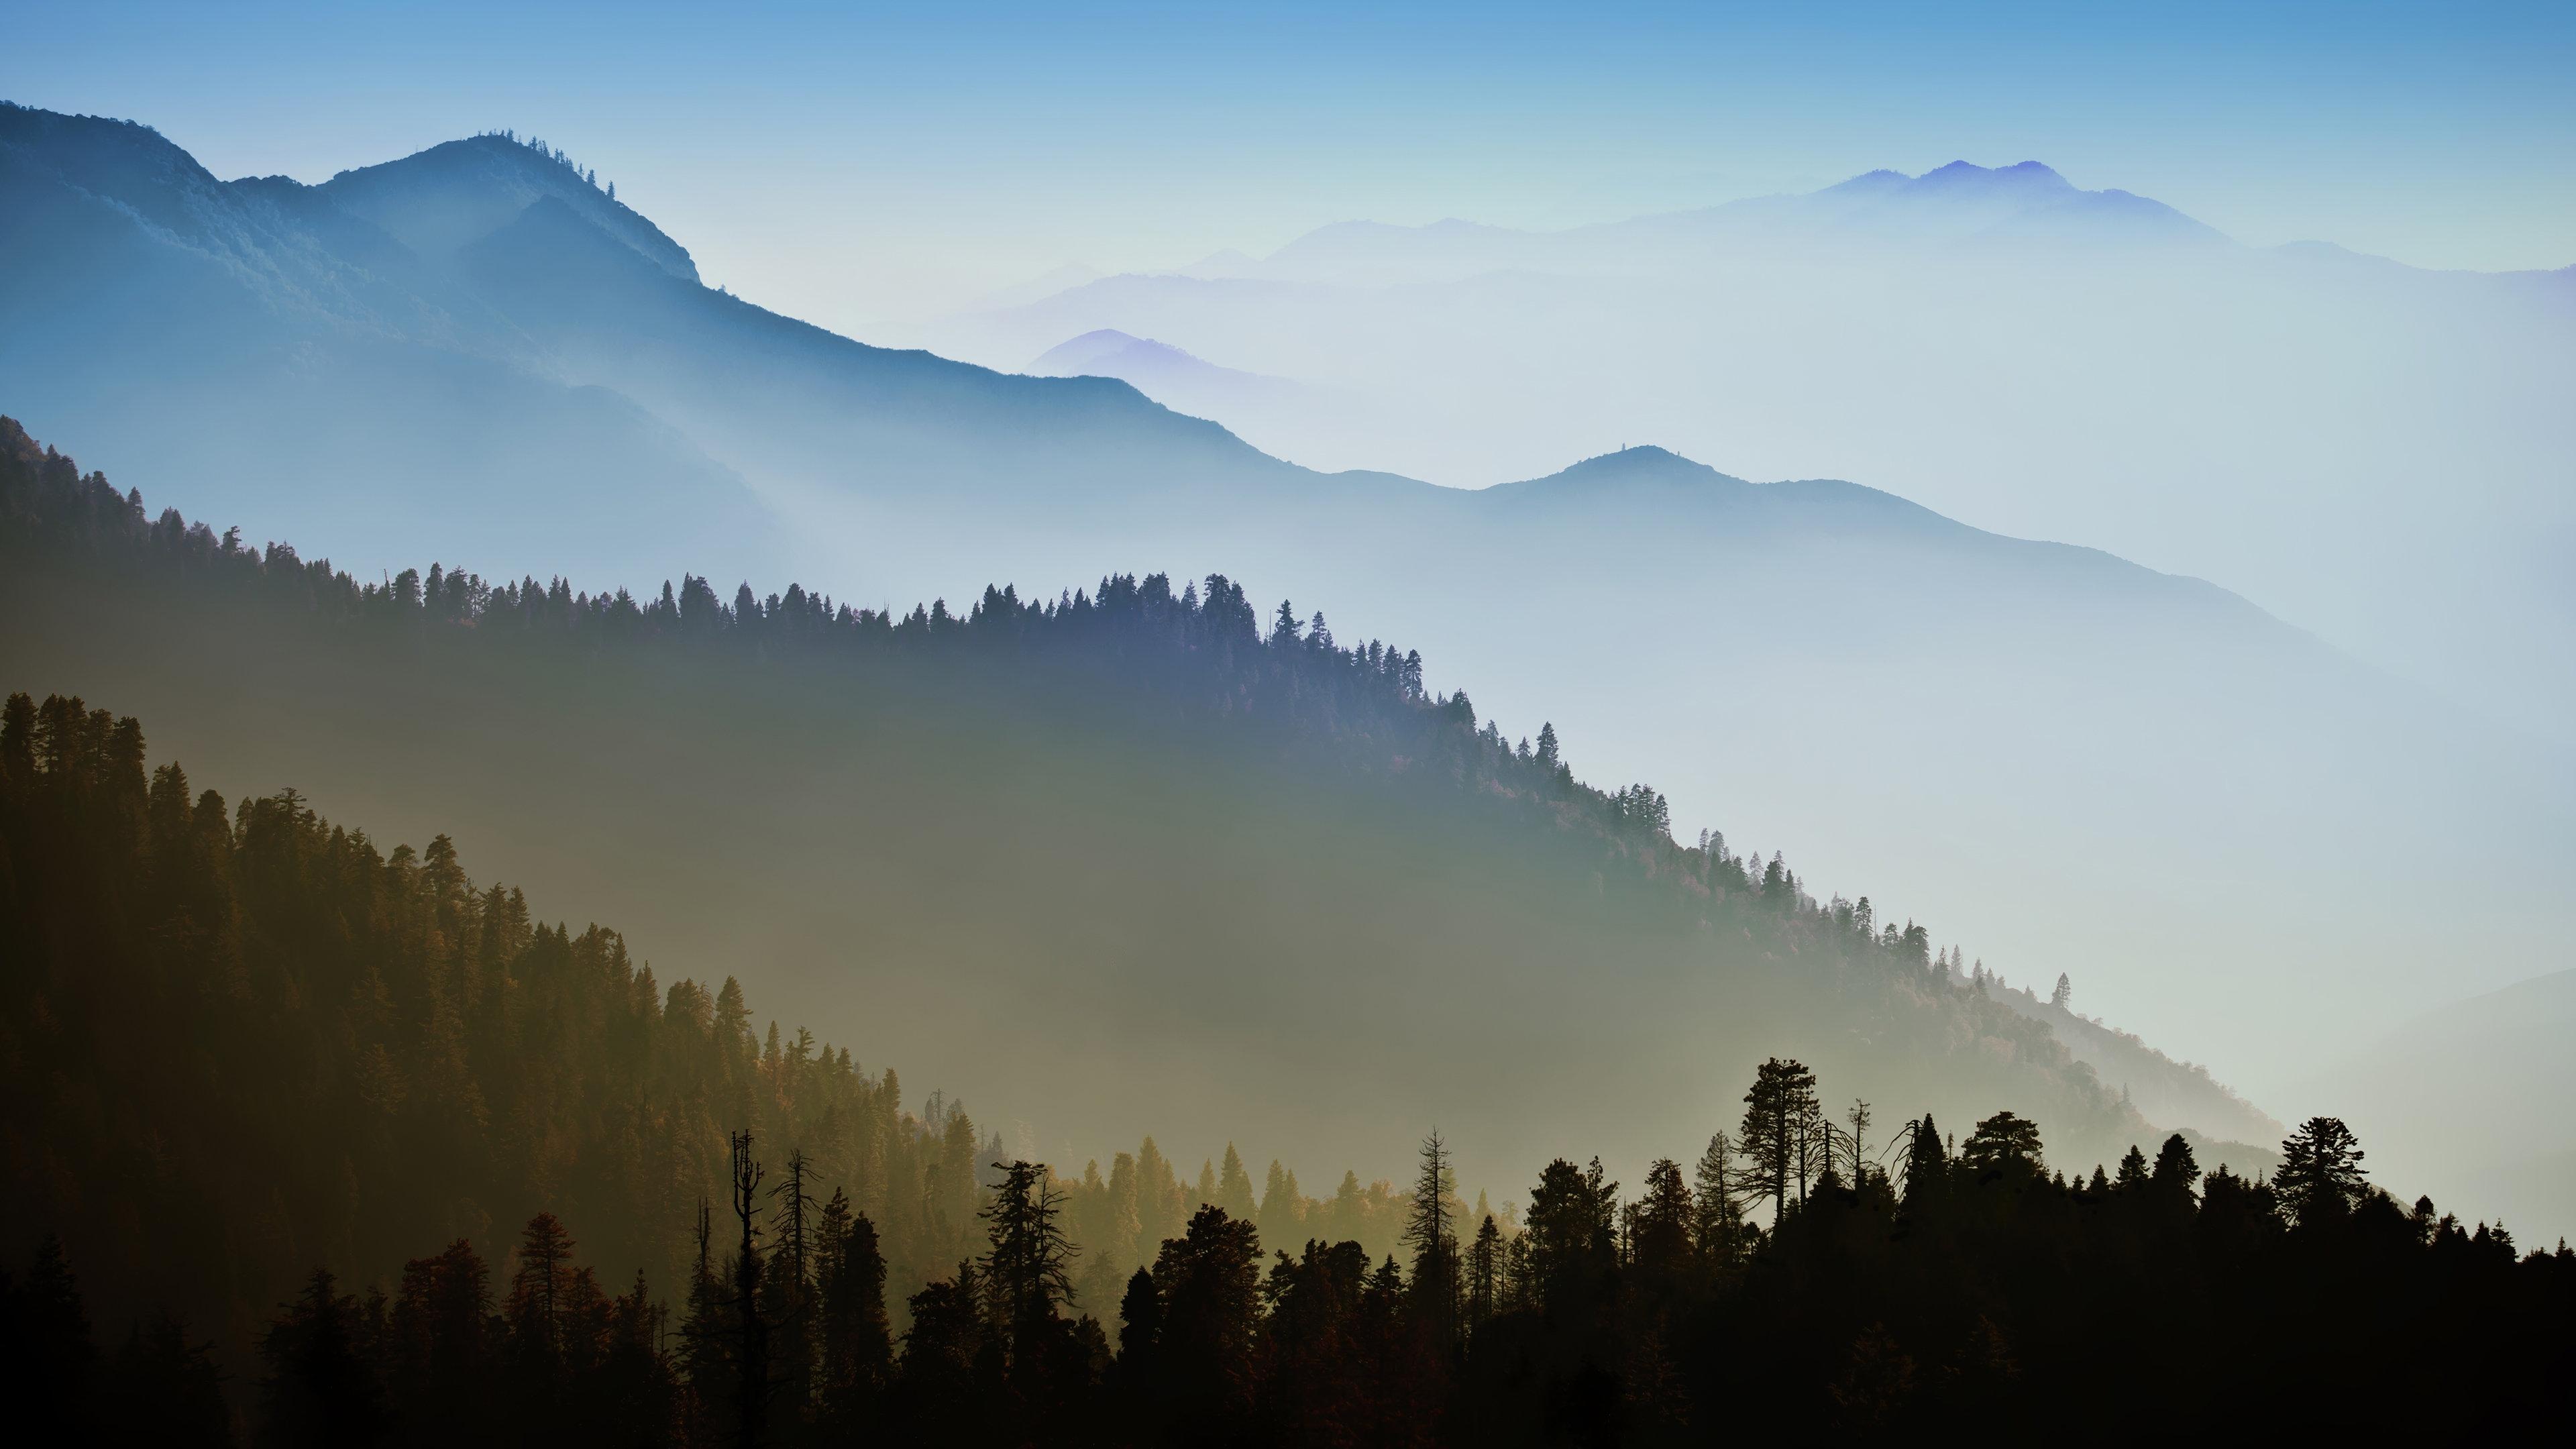 Nature Mountain Range Fog Sunrise 4K Ultra HD Wallpaper ...